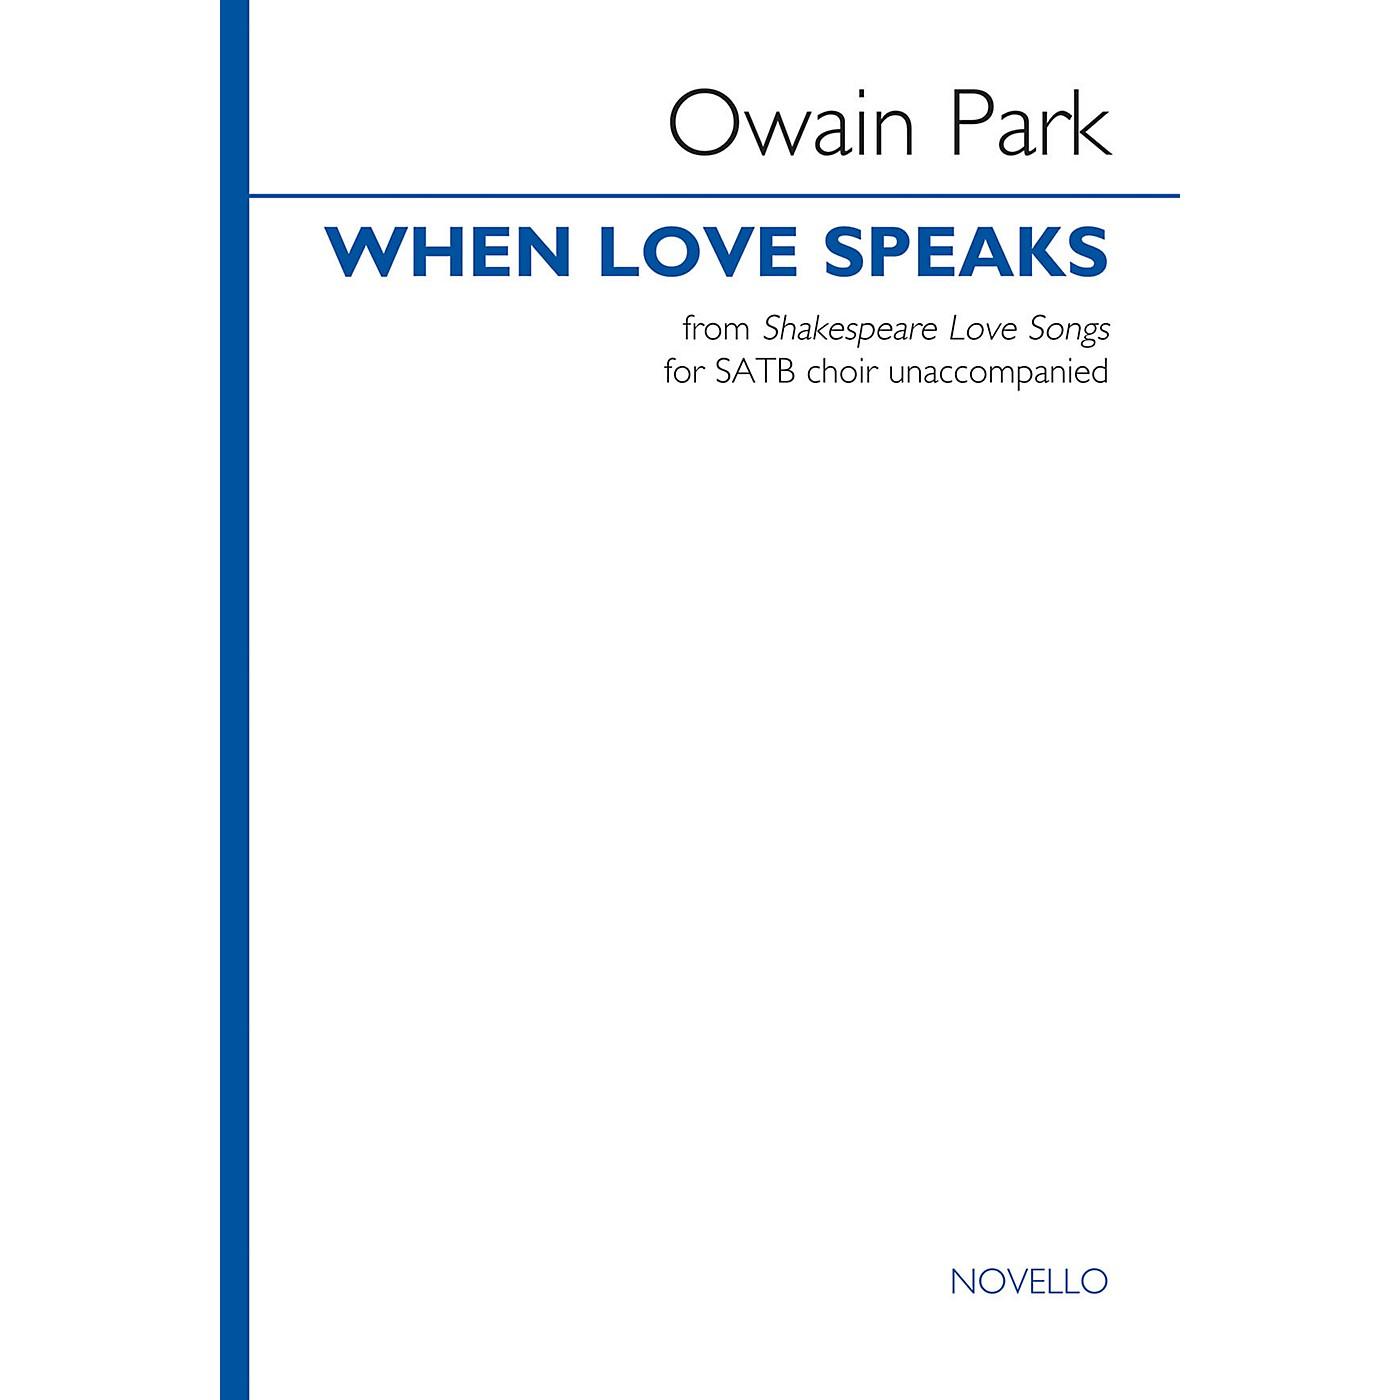 Novello When Love Speaks from Shakespeare Love Songs (SATB choir unaccompanied) SATB a cappella by Owain Park thumbnail